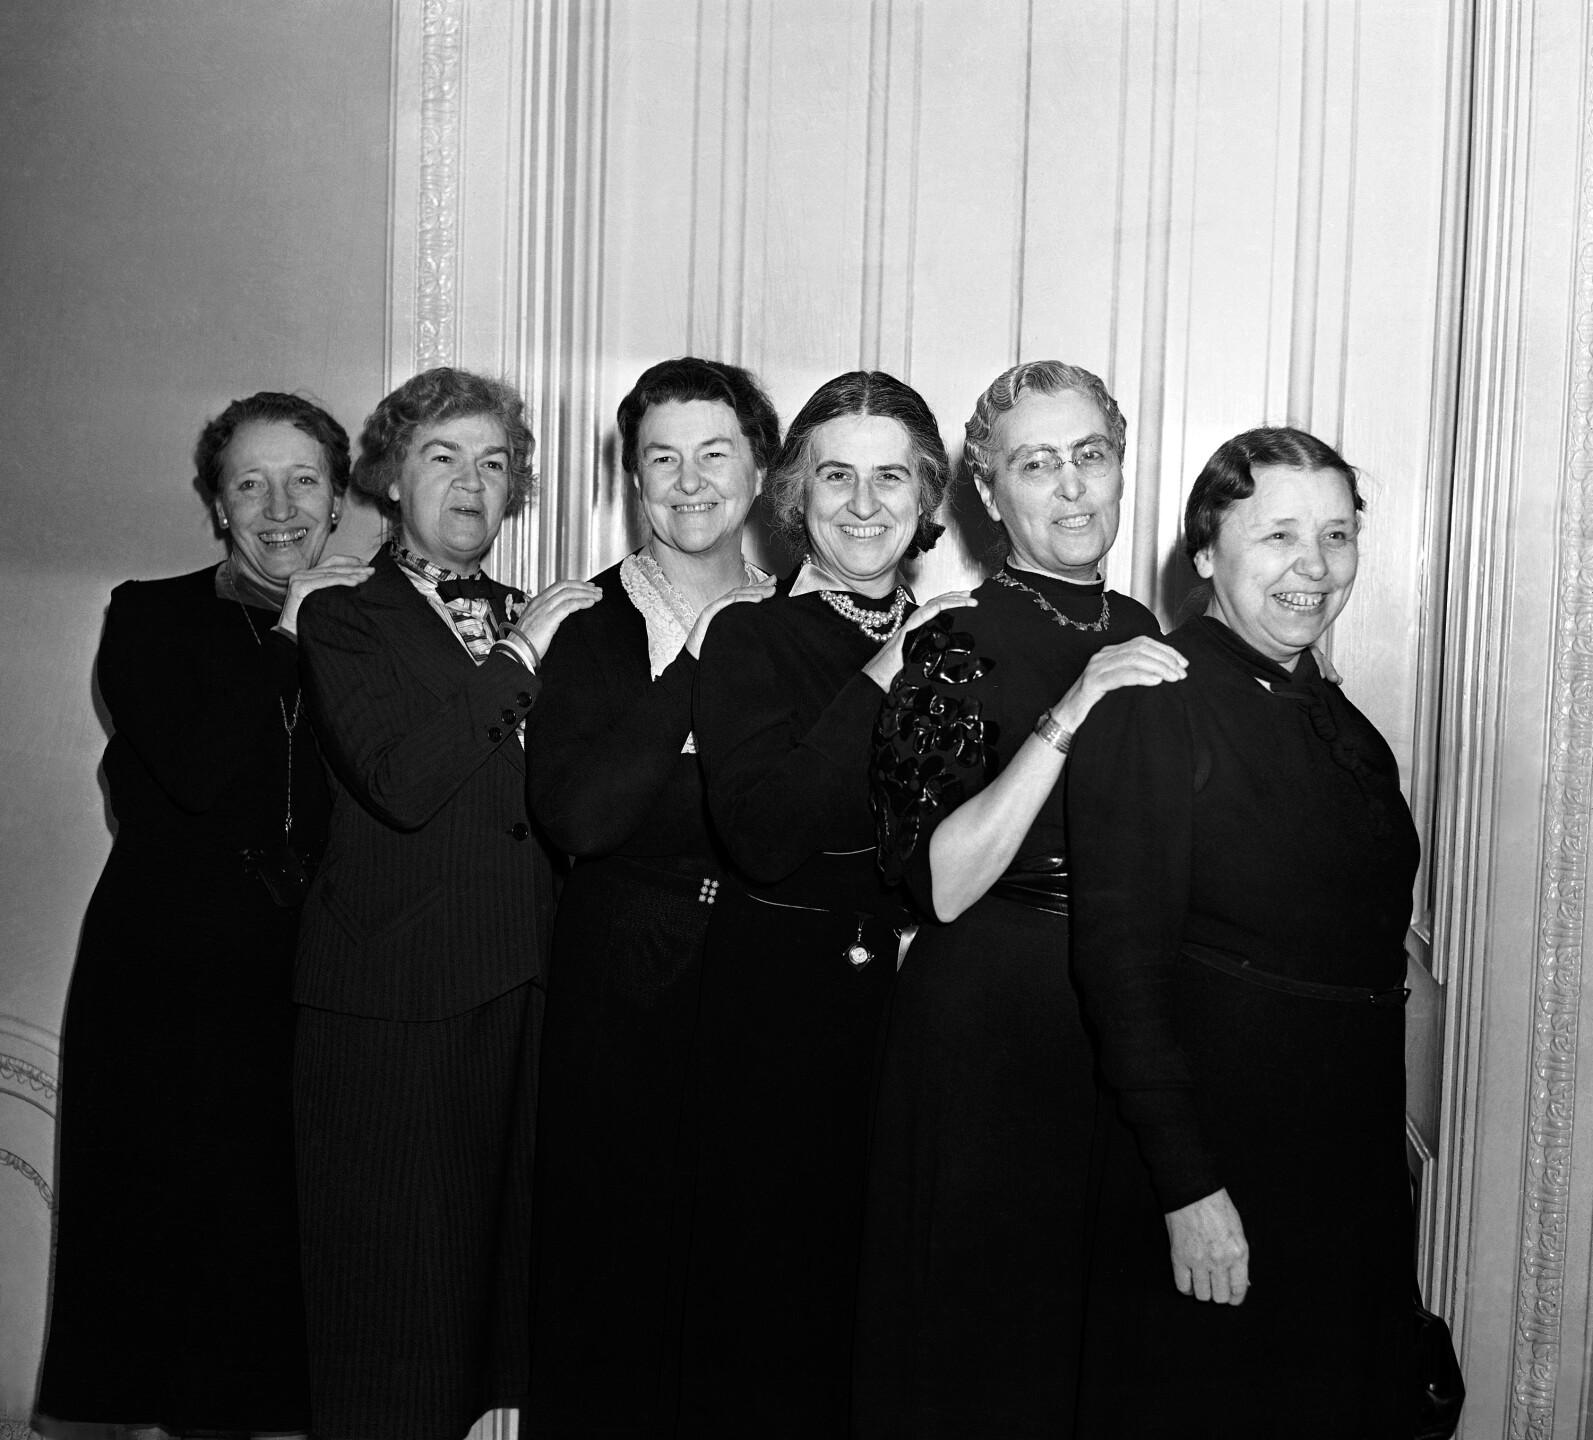 Edith Nourse Rogers, Caroline O'Day, Mary Norton, Nan Honeyman, Virginia Jenckes, Hatty Carraway